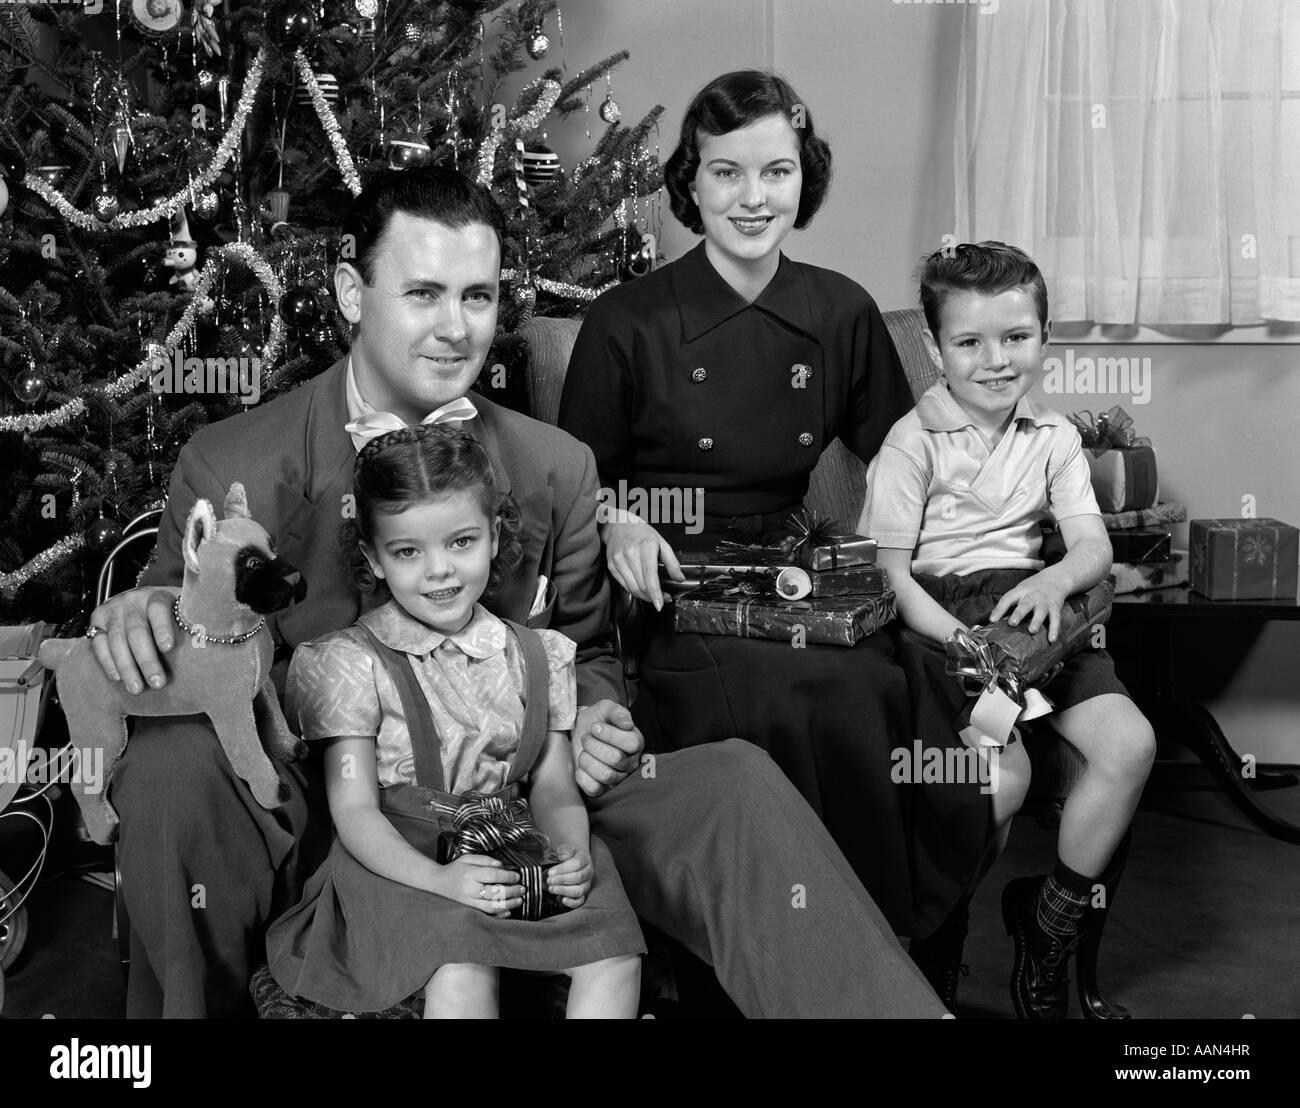 1940s 1950s Family Sitting Around Christmas Tree Holding